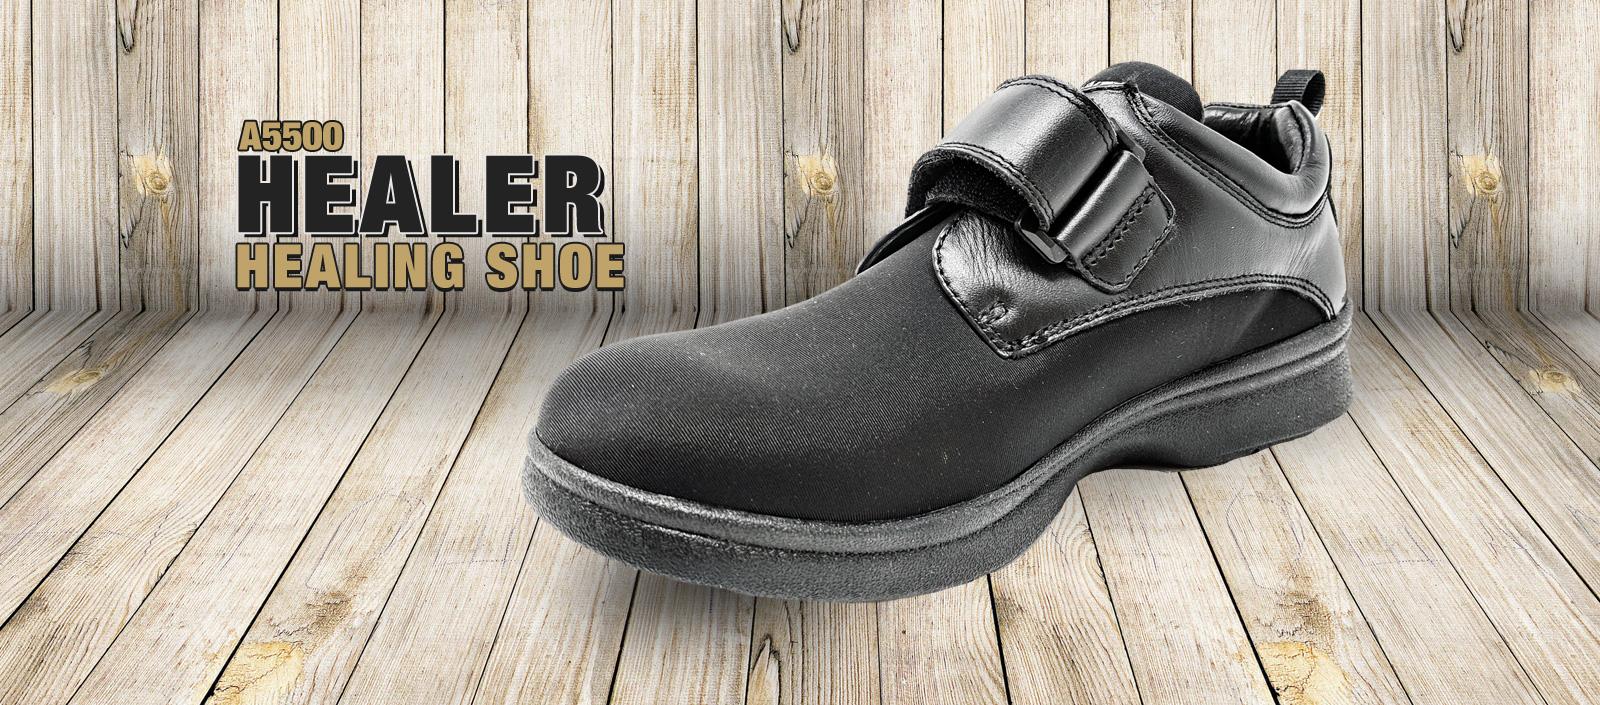 I Runner Diabetic Shoes Stylish Amp Distinct Diabetic